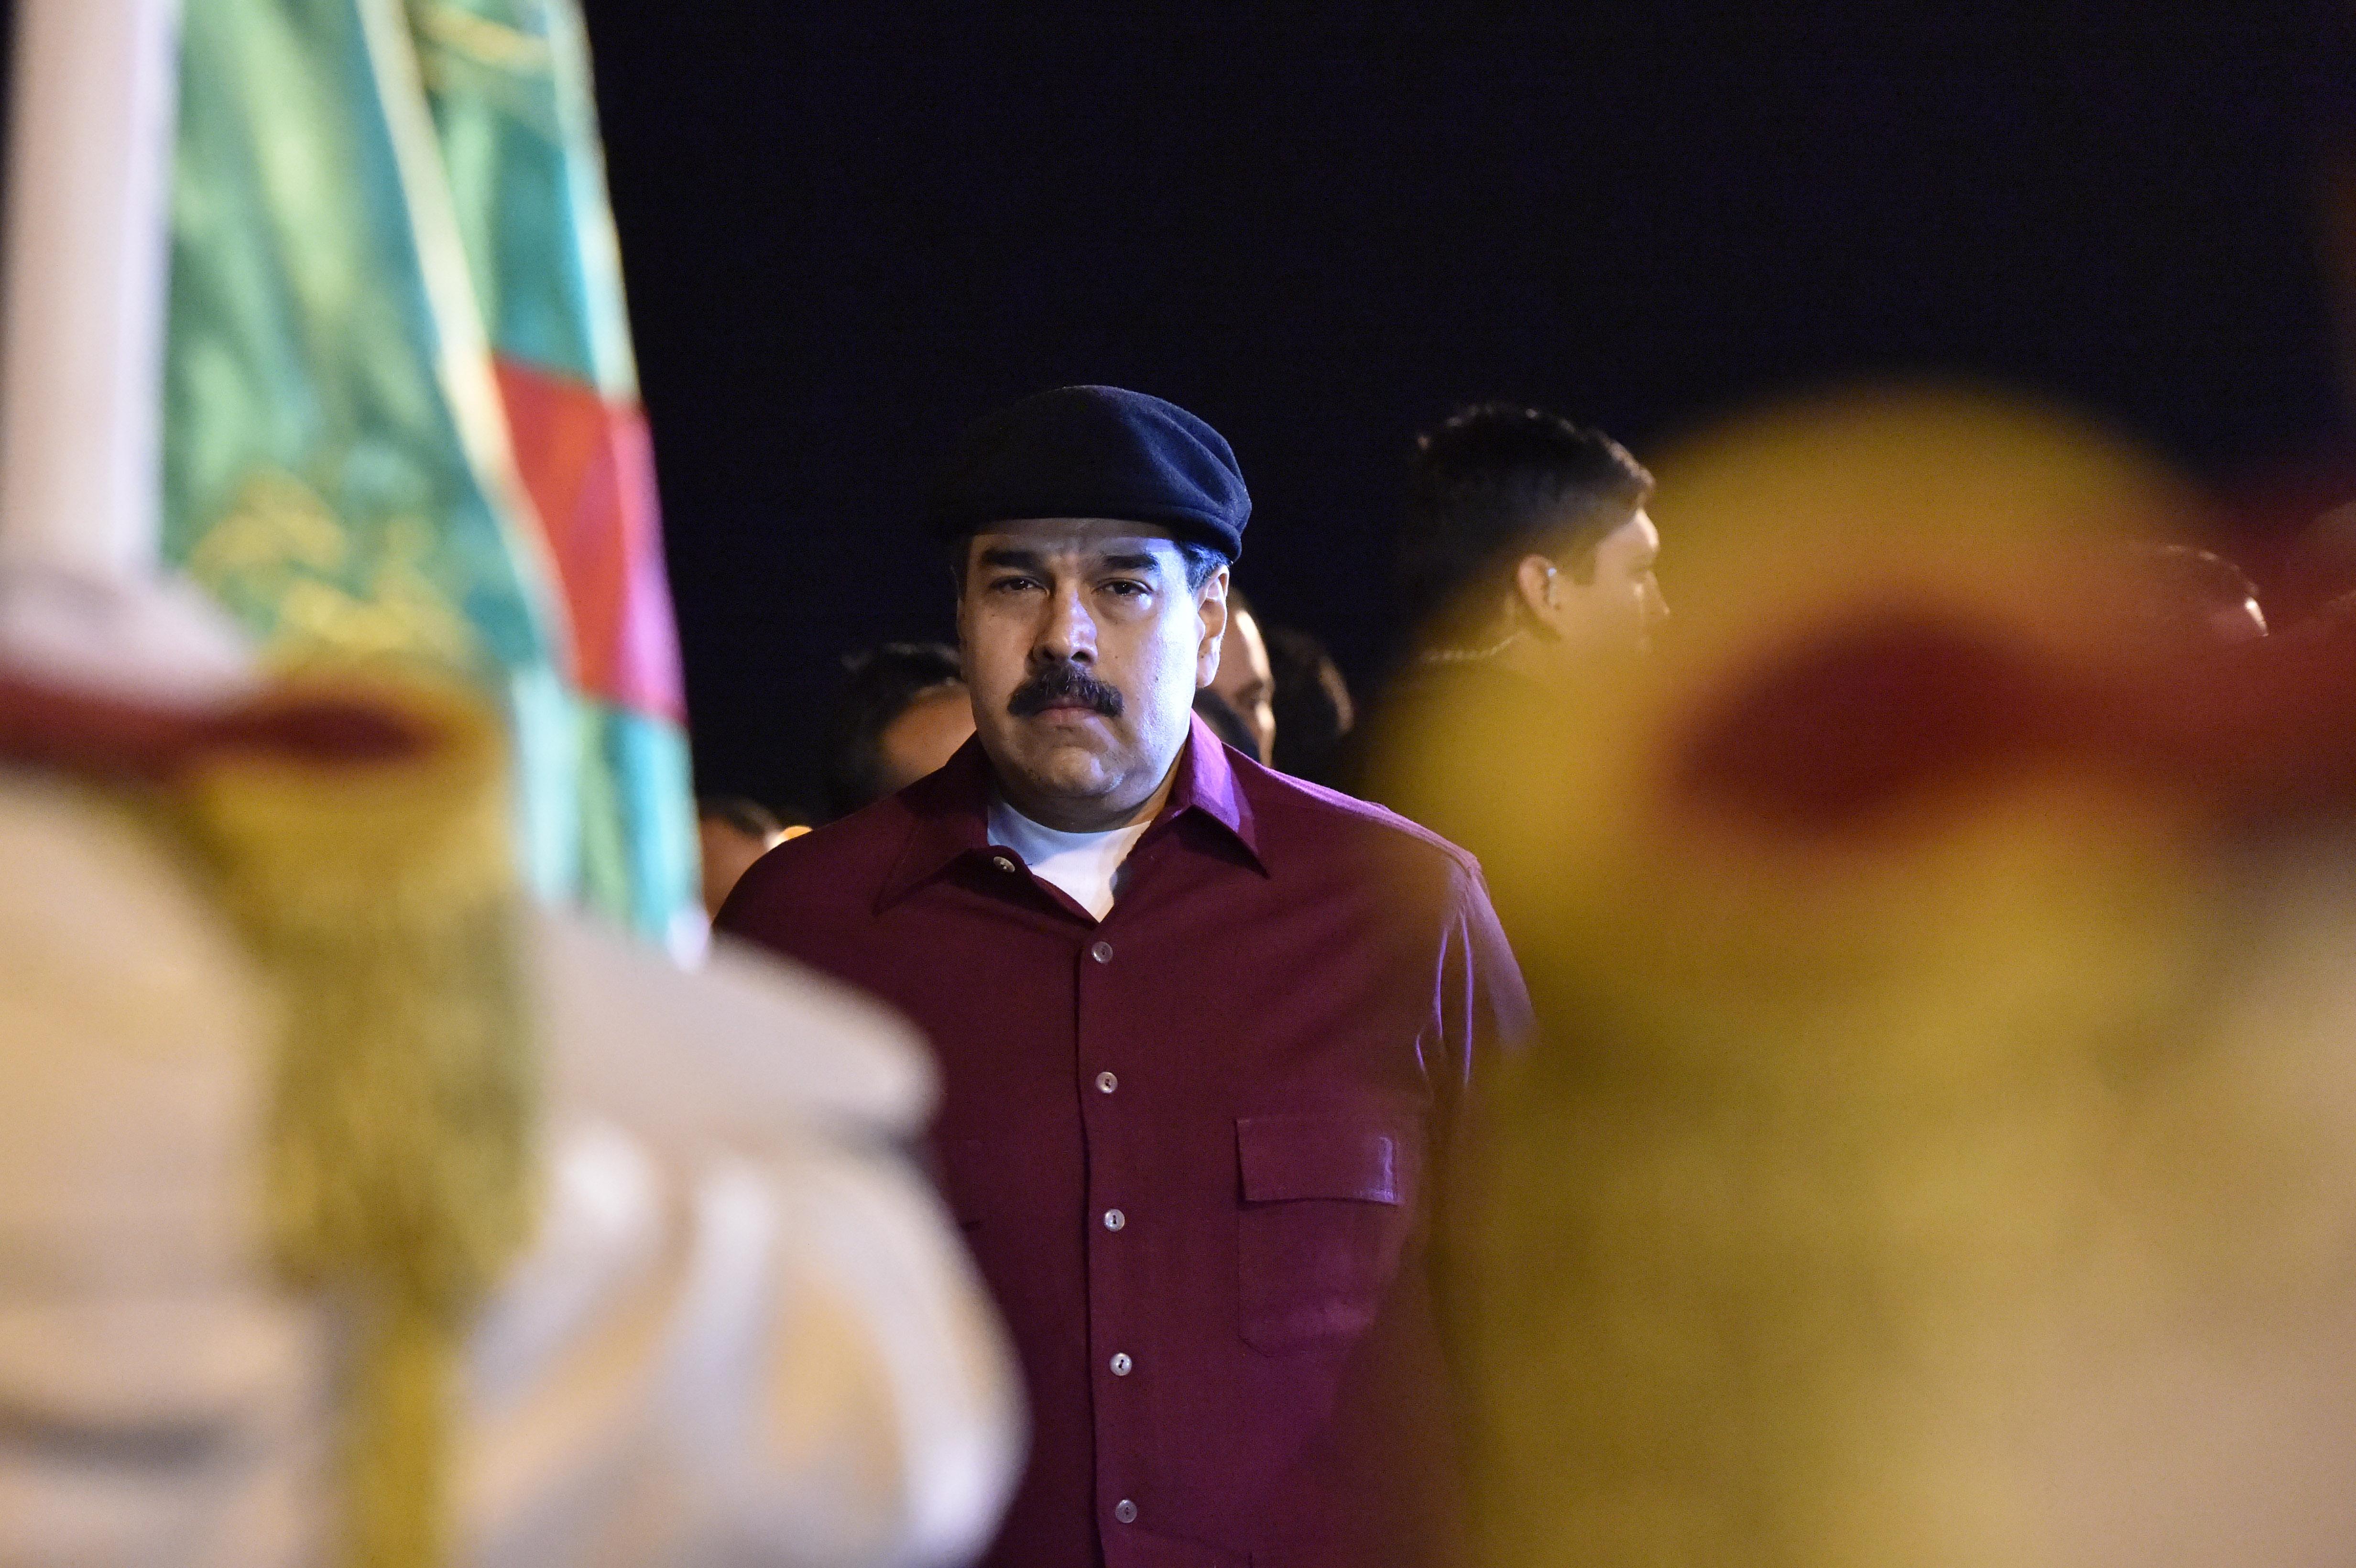 Venezuelan communist leader Nicolas Maduro arrives at the Houari Boumedien Airport in Algiers for a two-day visit on Sept. 10, 2017. (RYAD KRAMDI/AFP/Getty Images)